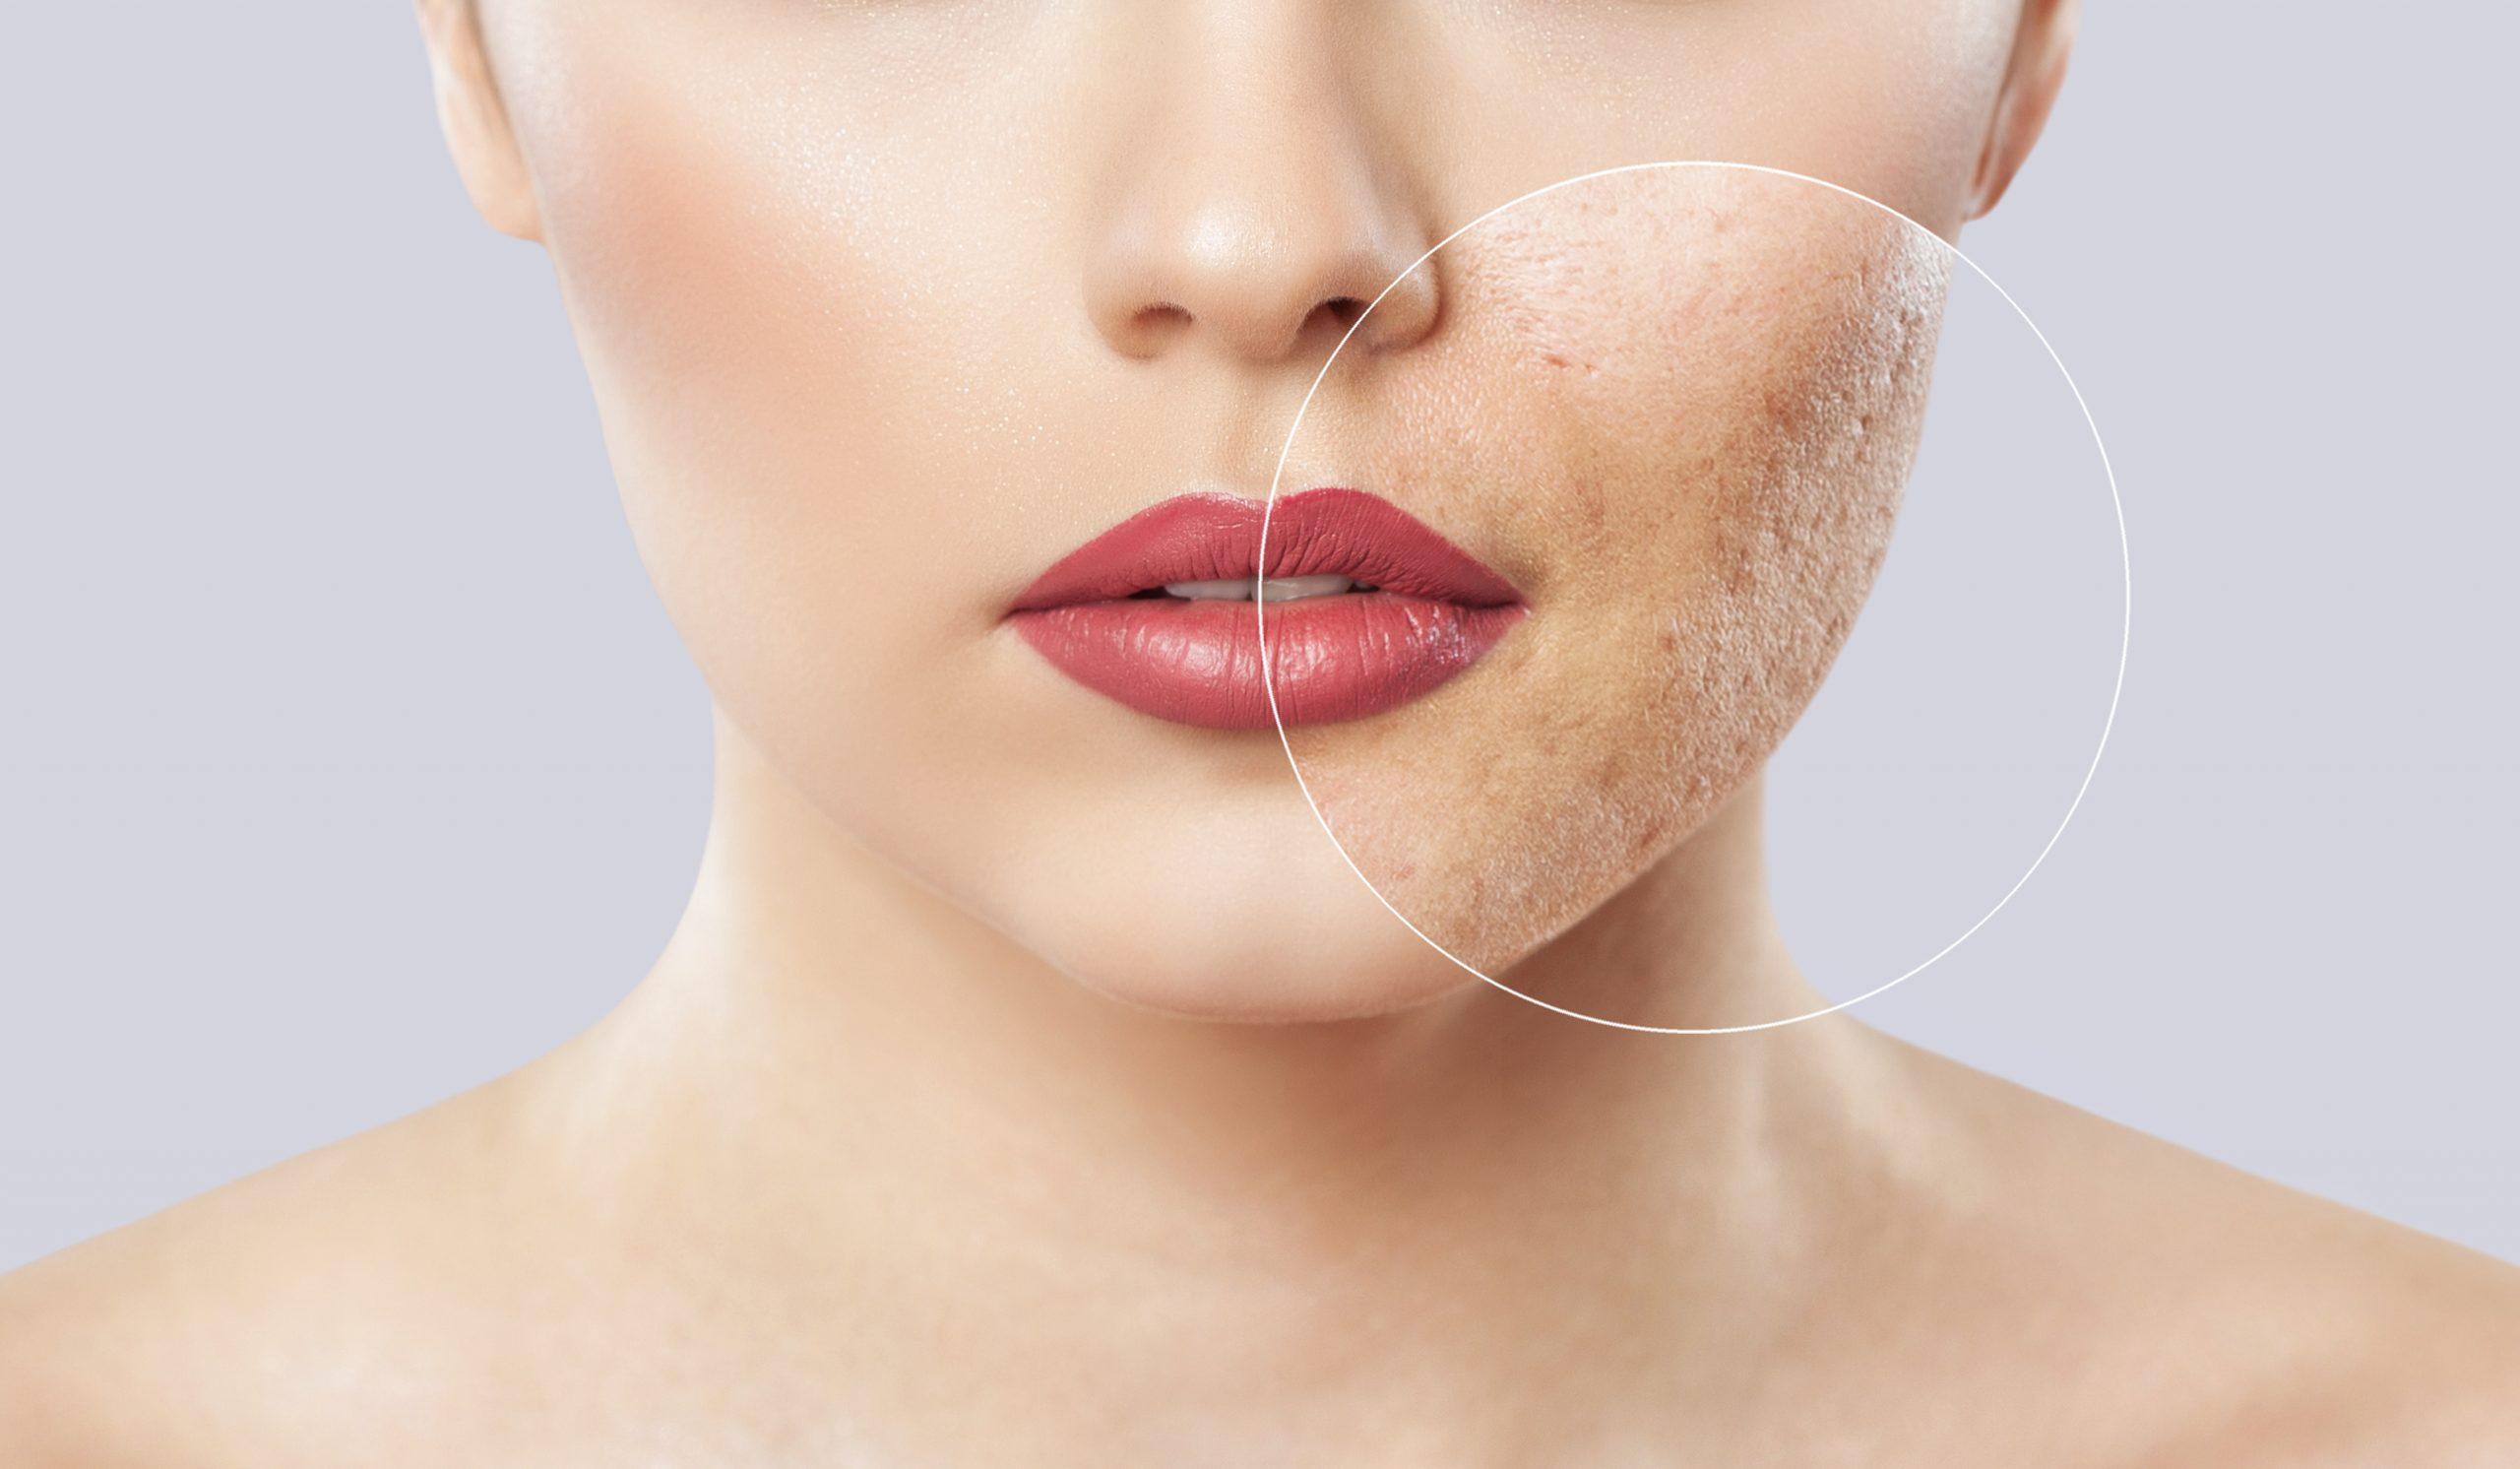 tixel skin resurfacing skin cosmetics london